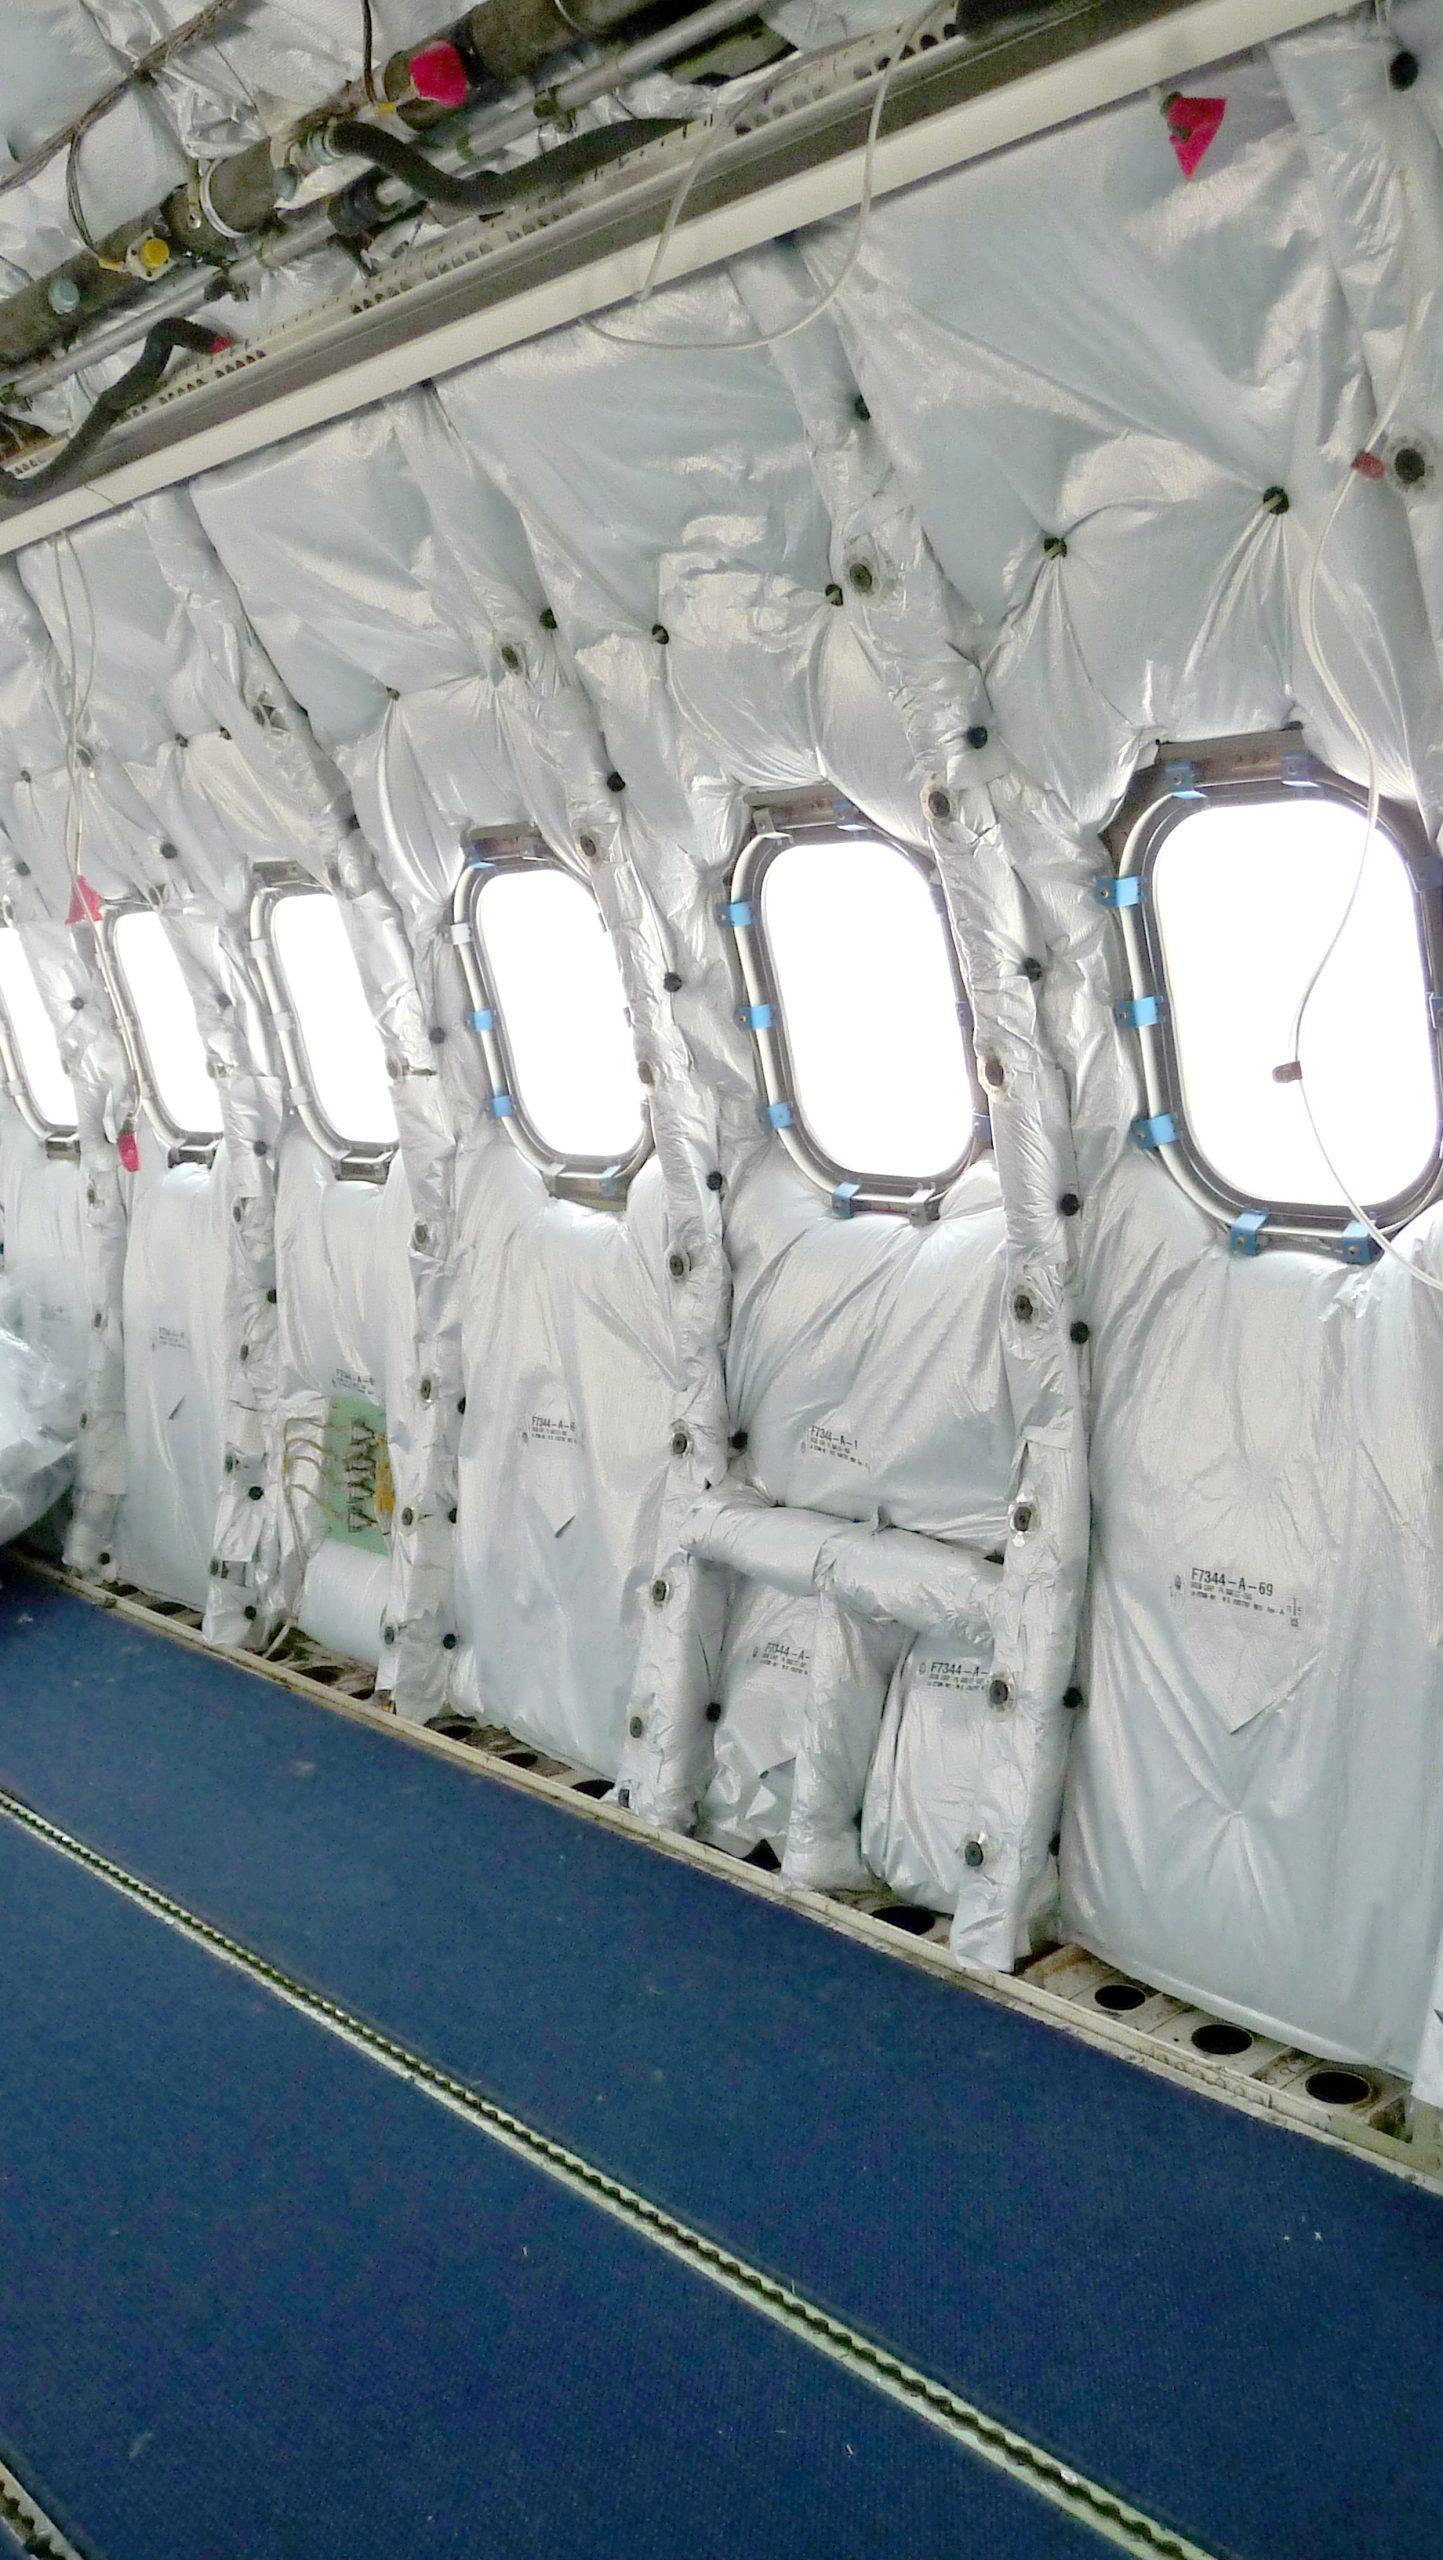 Aircraft interior showing insulation